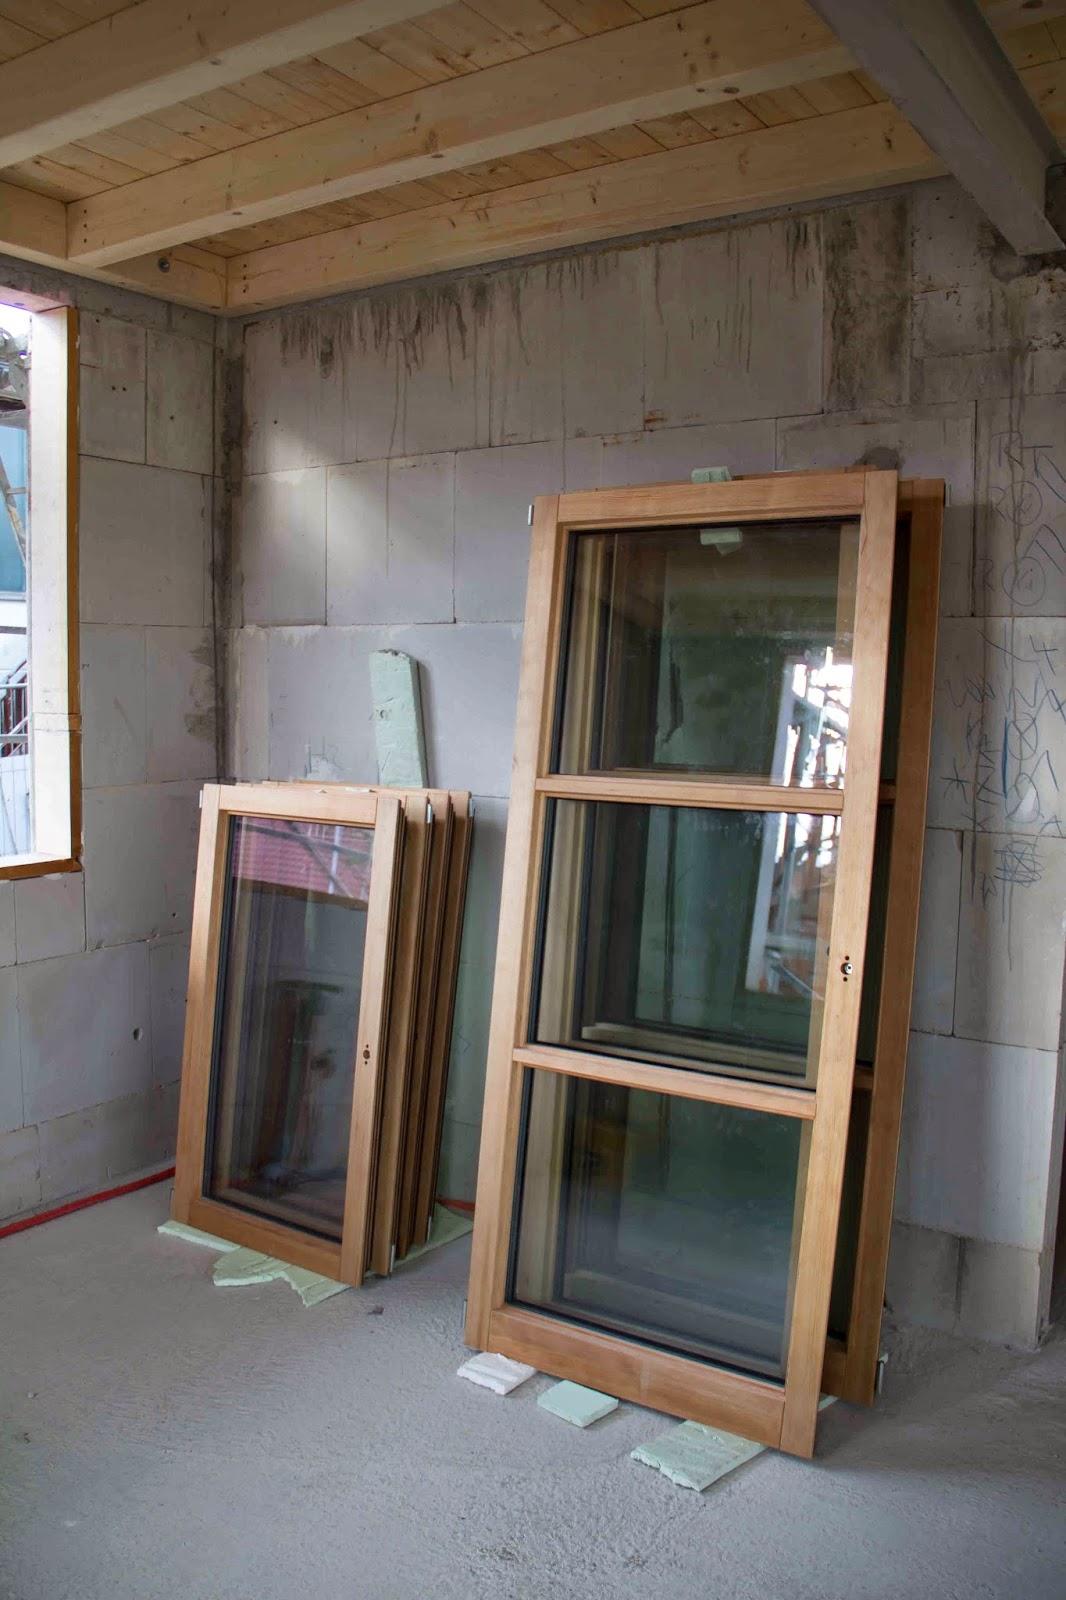 flederhaus fenster mit insektenschutz gipskarton badezimmer technik. Black Bedroom Furniture Sets. Home Design Ideas